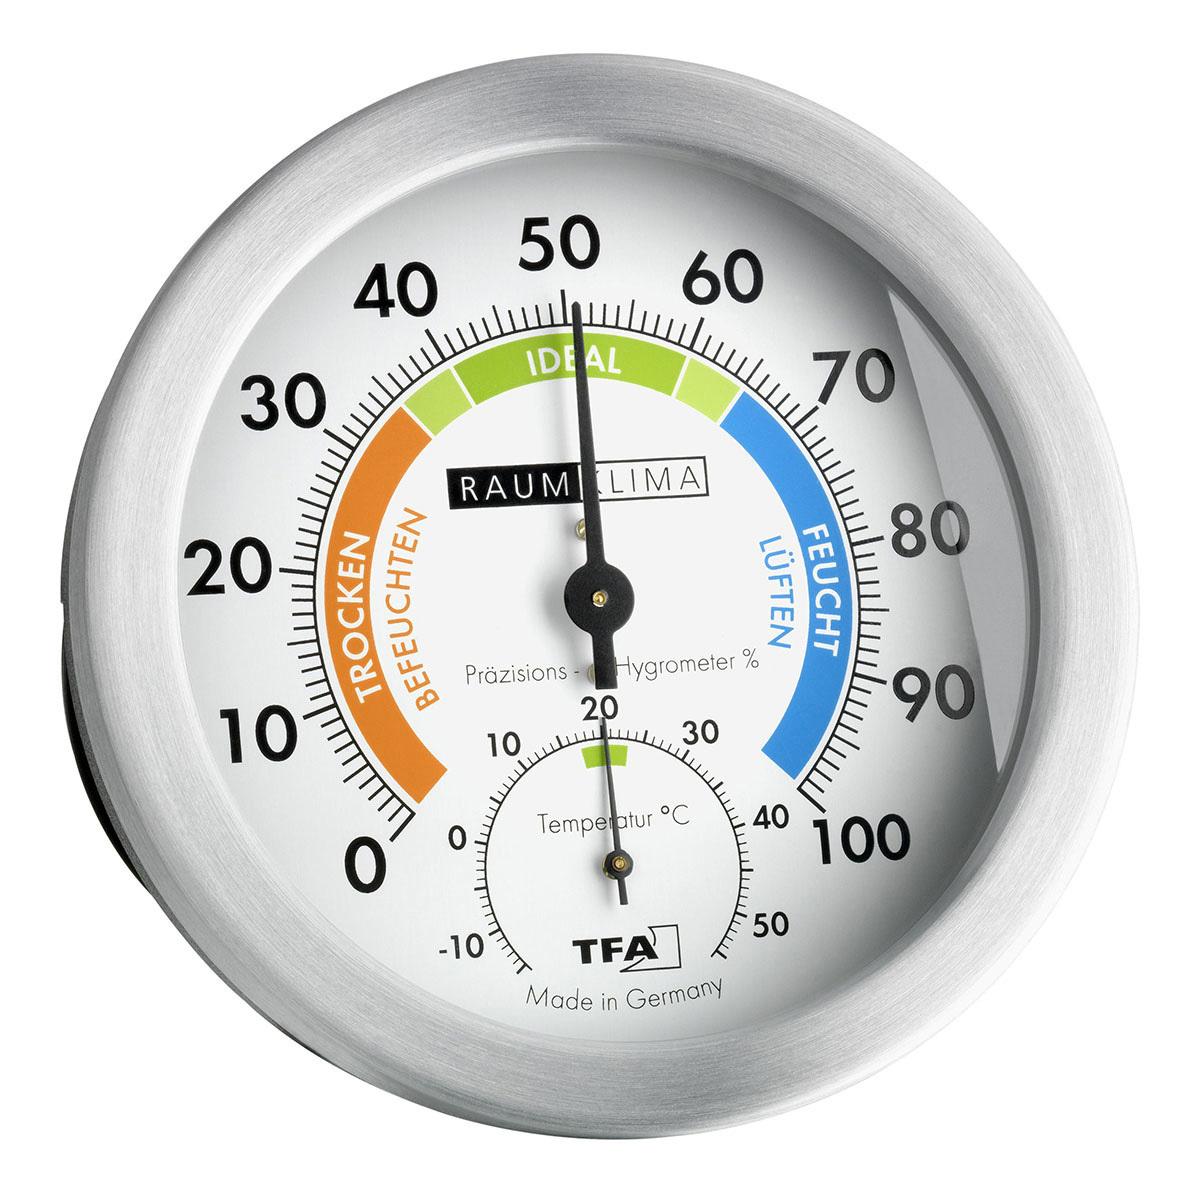 45-2028-analoges-thermo-hygrometer-mit-metallring-1200x1200px.jpg